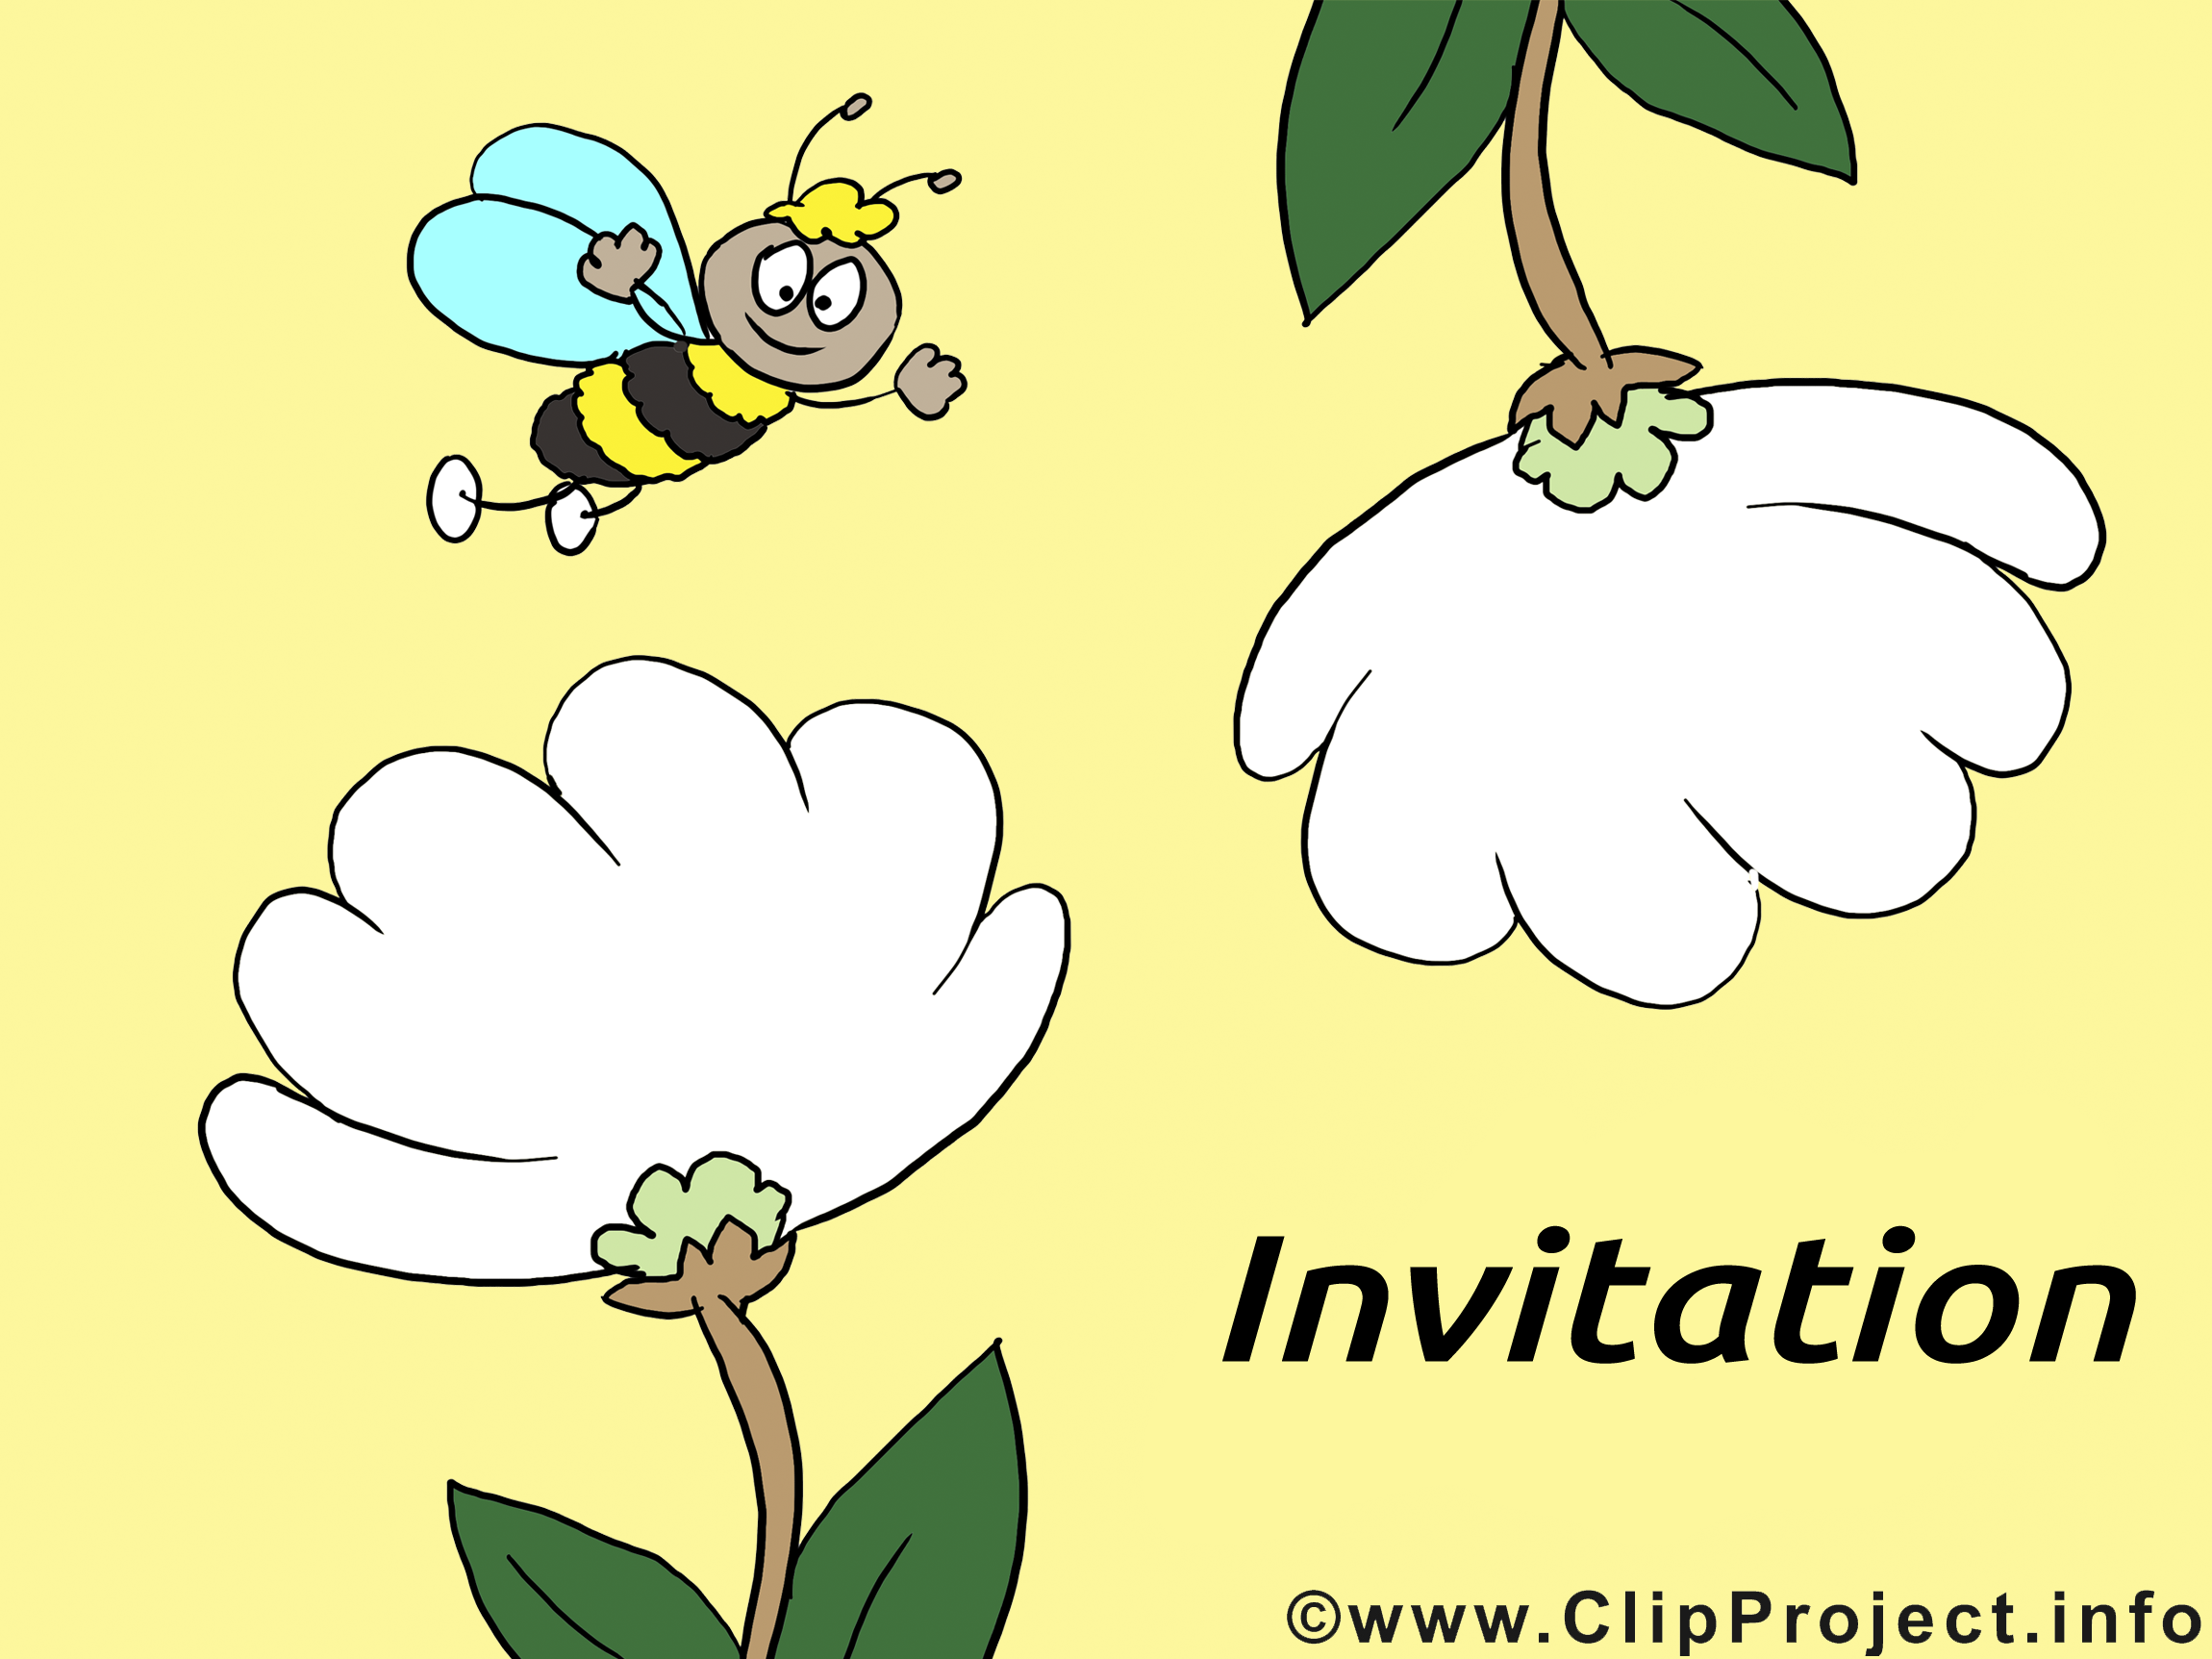 Abeille image gratuite - Invitation illustration